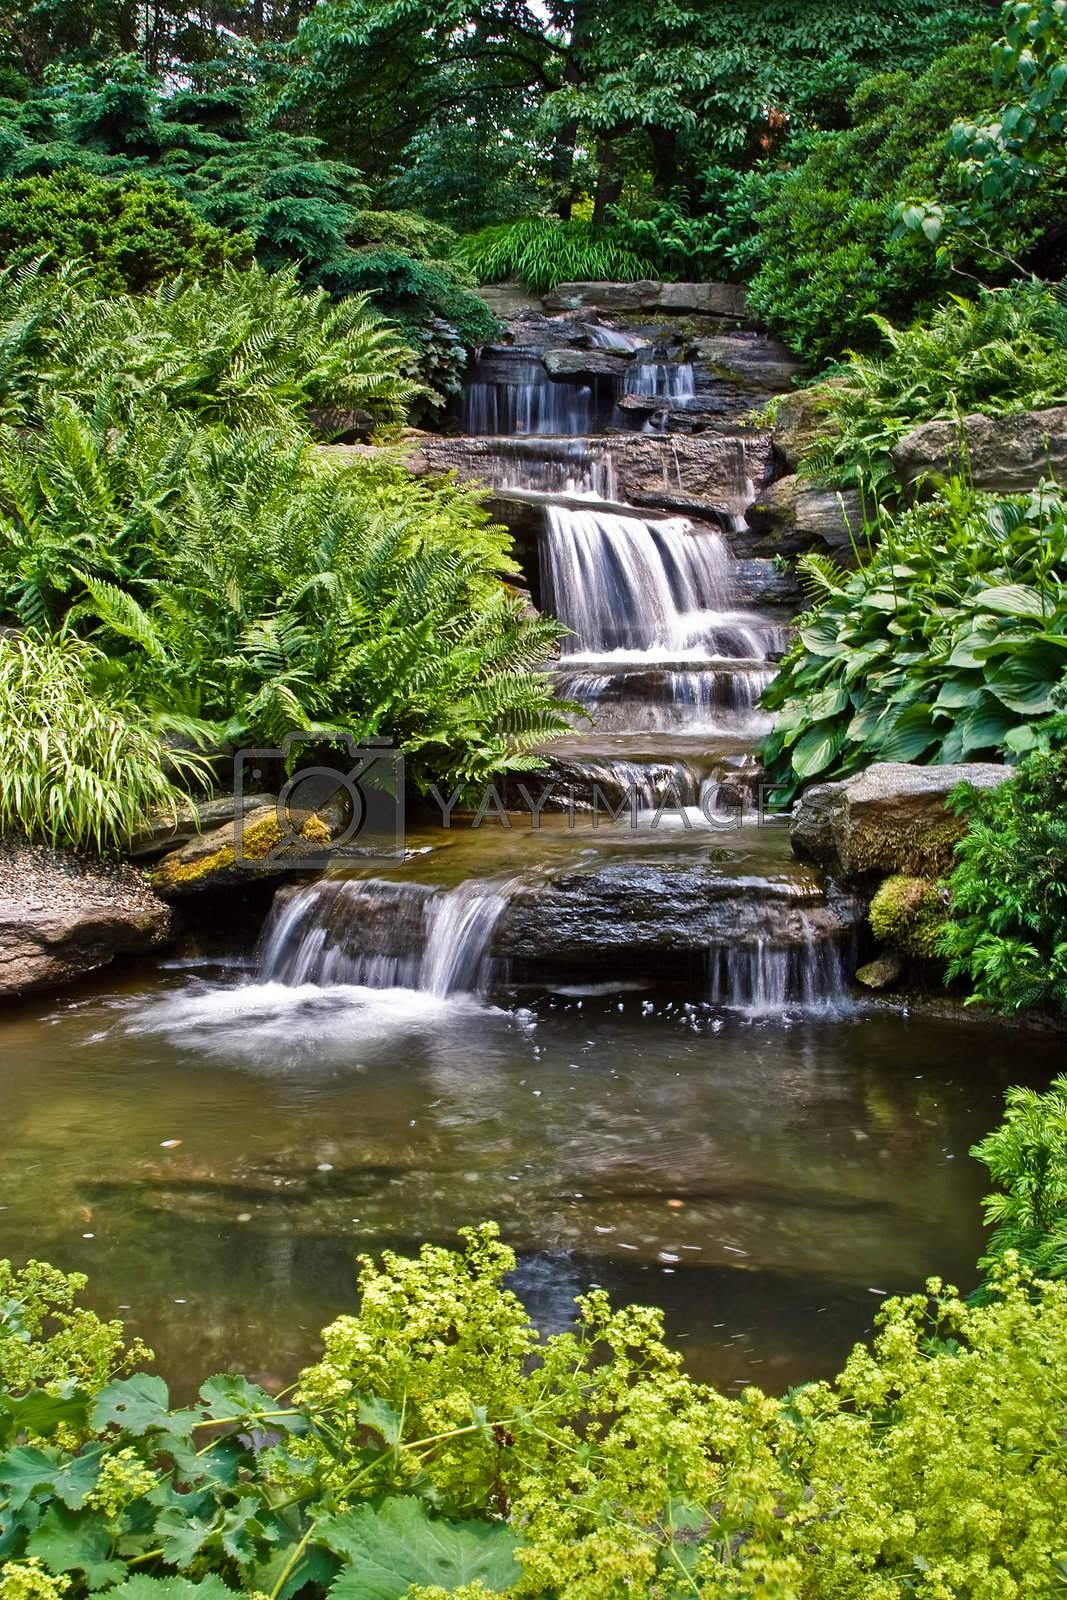 Beautiful multi-layered waterfall between vegetation.